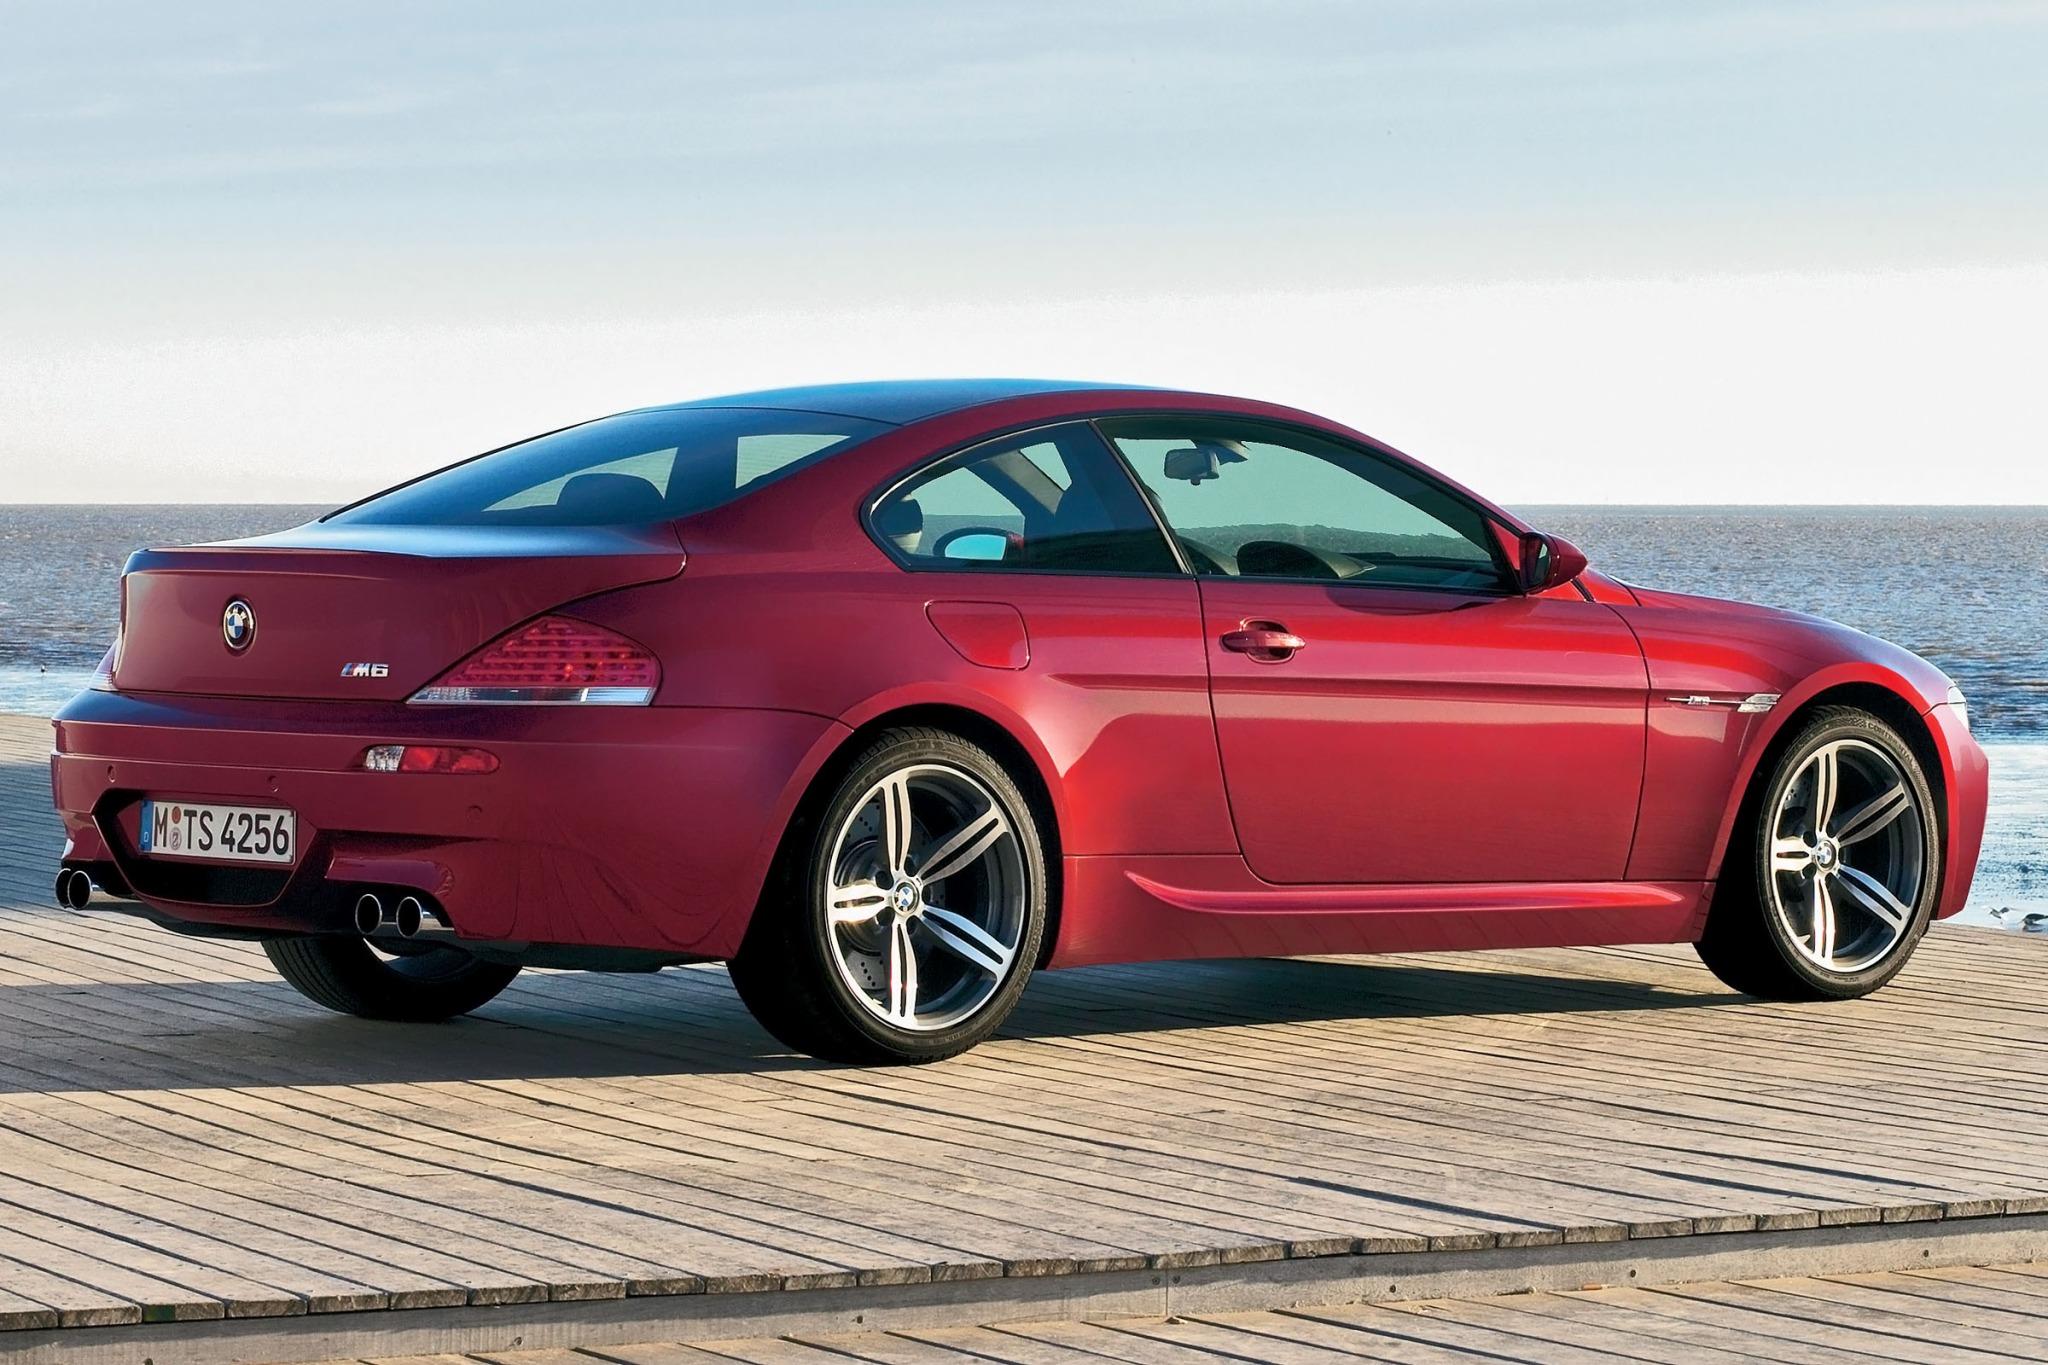 Bmw M6 Coupe >> 2007 BMW M6 - Image #8